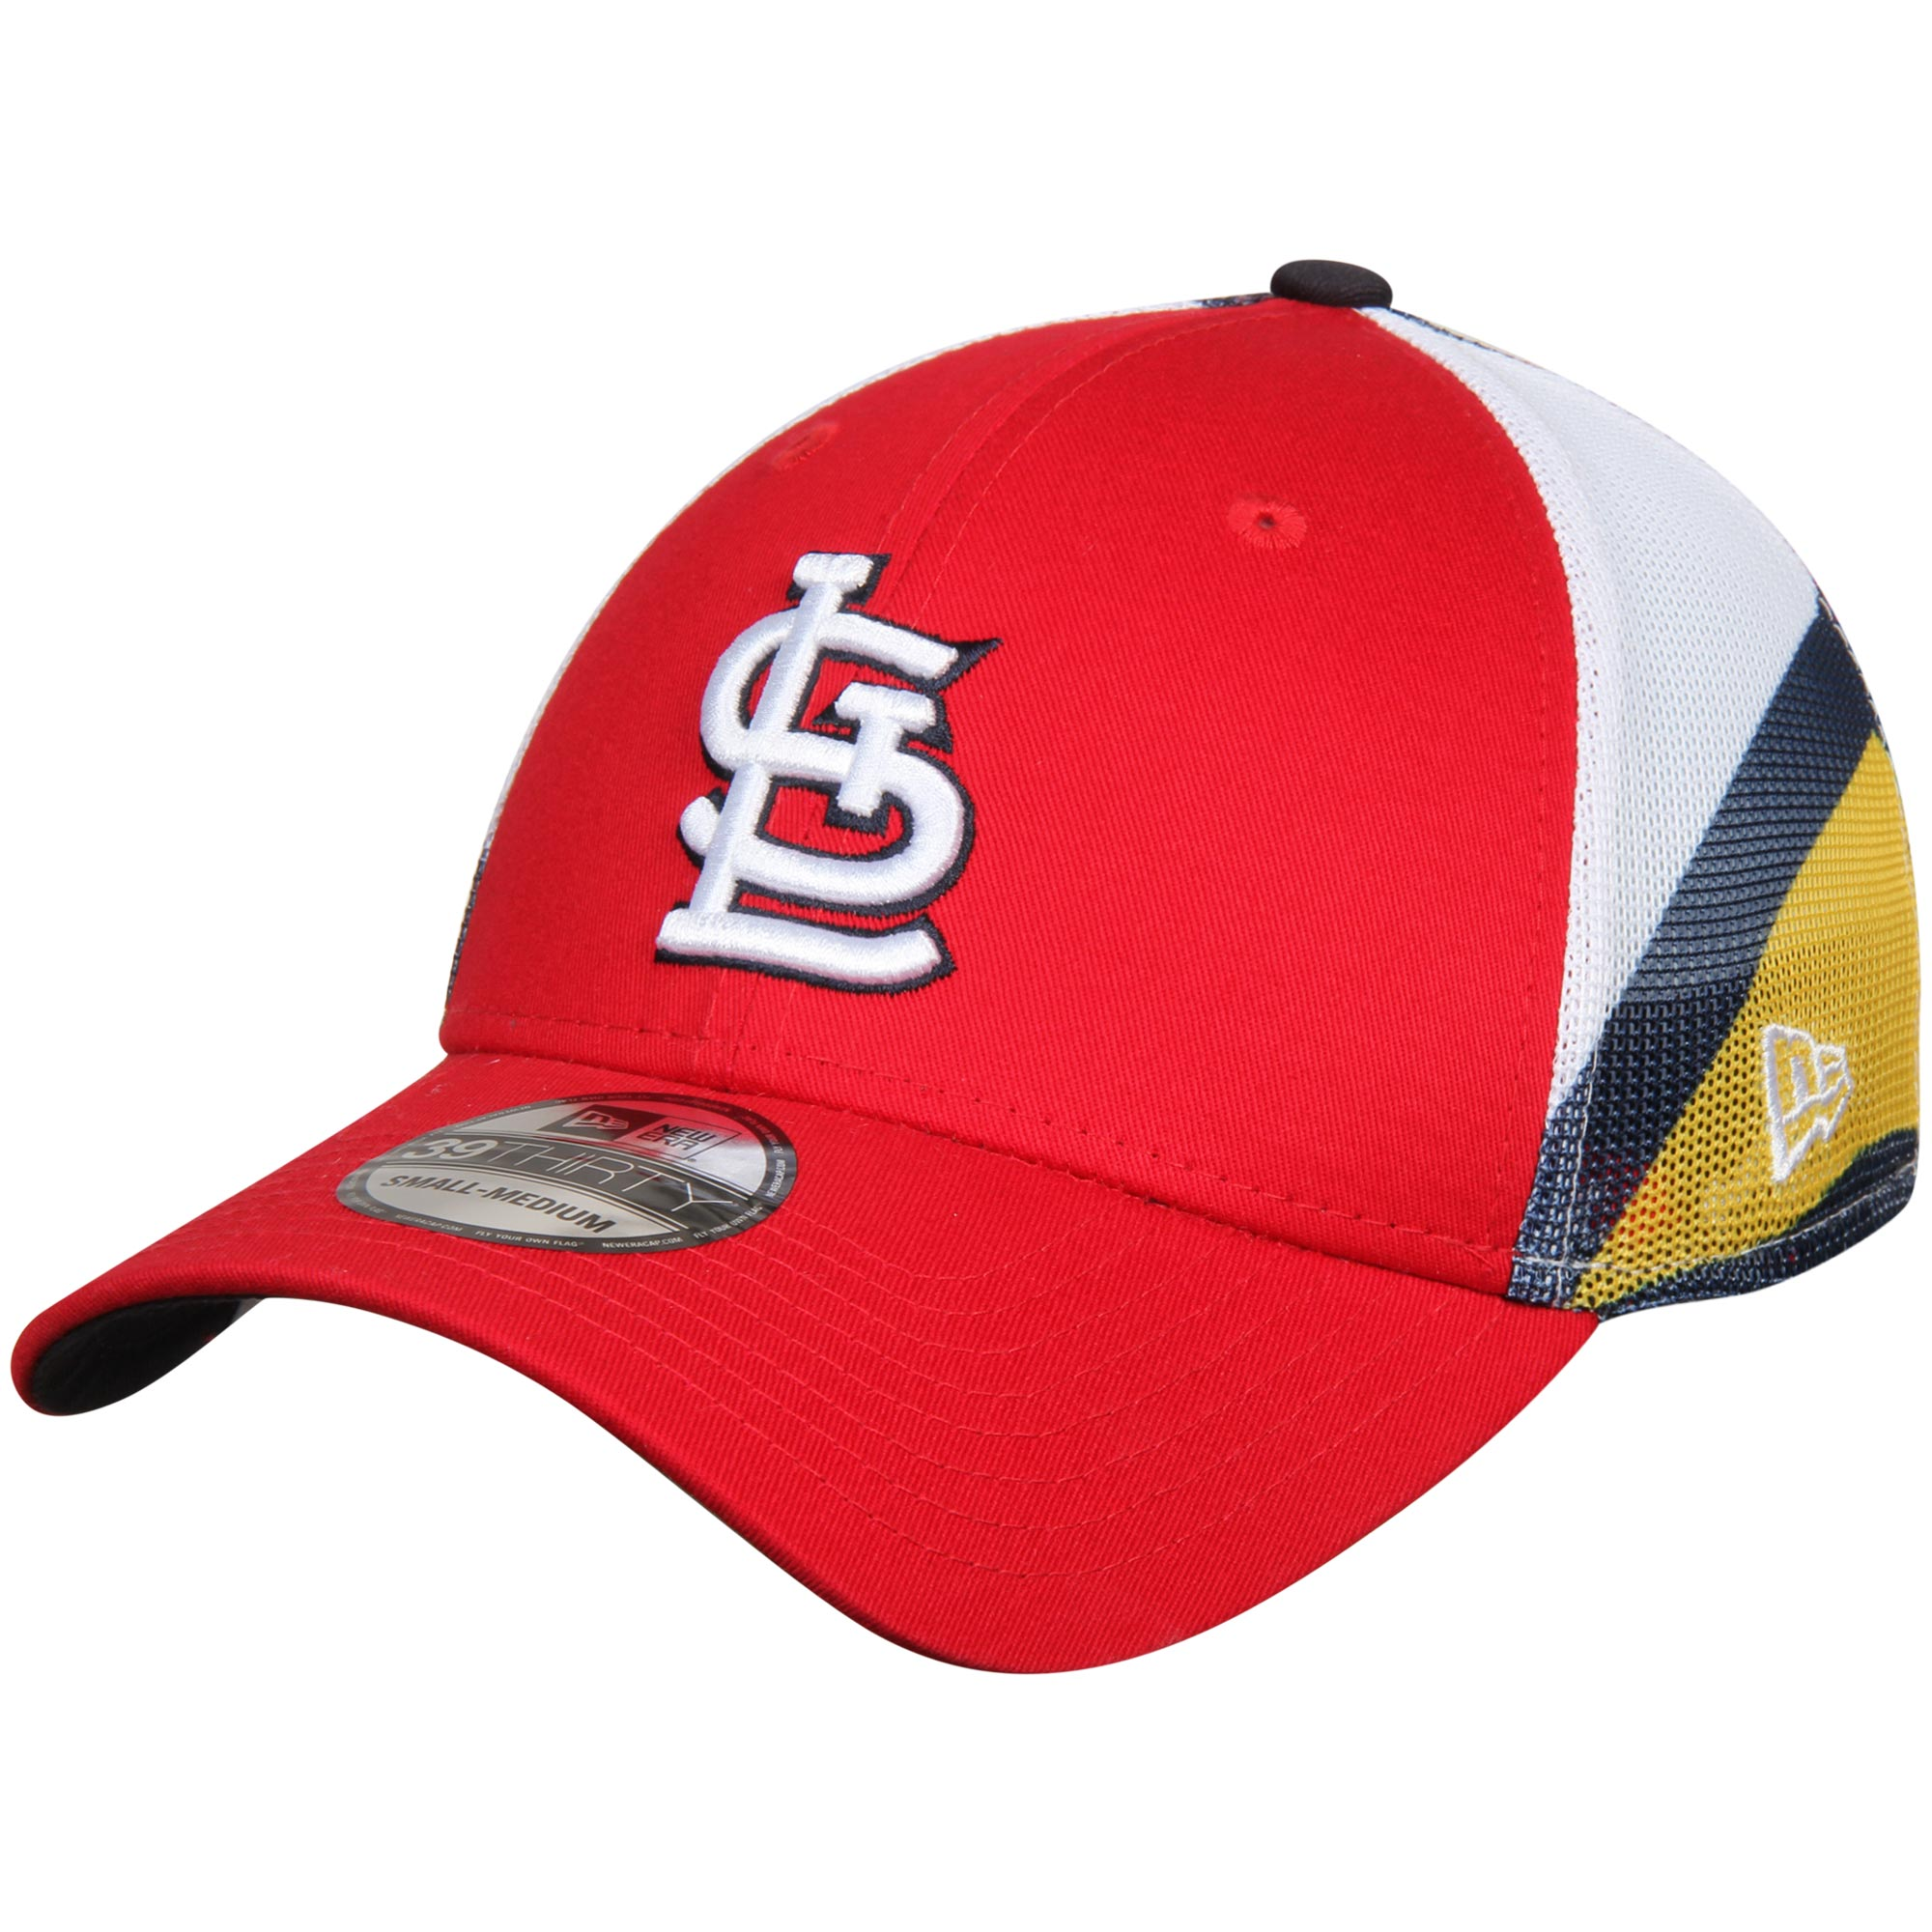 St. Louis Cardinals New Era Logo Wrapped 39THIRTY Flex Hat - Red